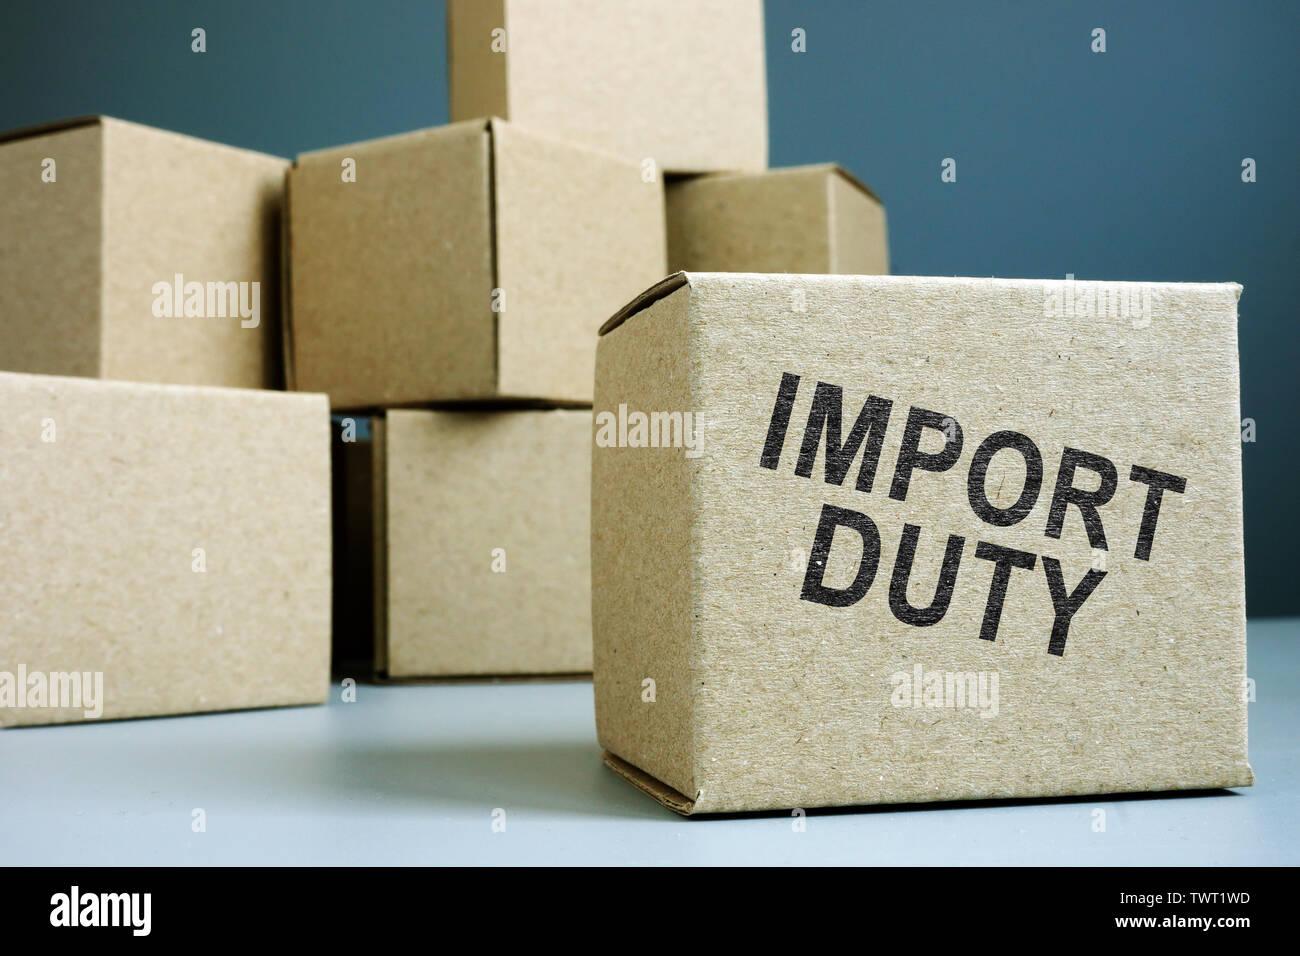 Customs Declaration Form Stock Photos & Customs Declaration